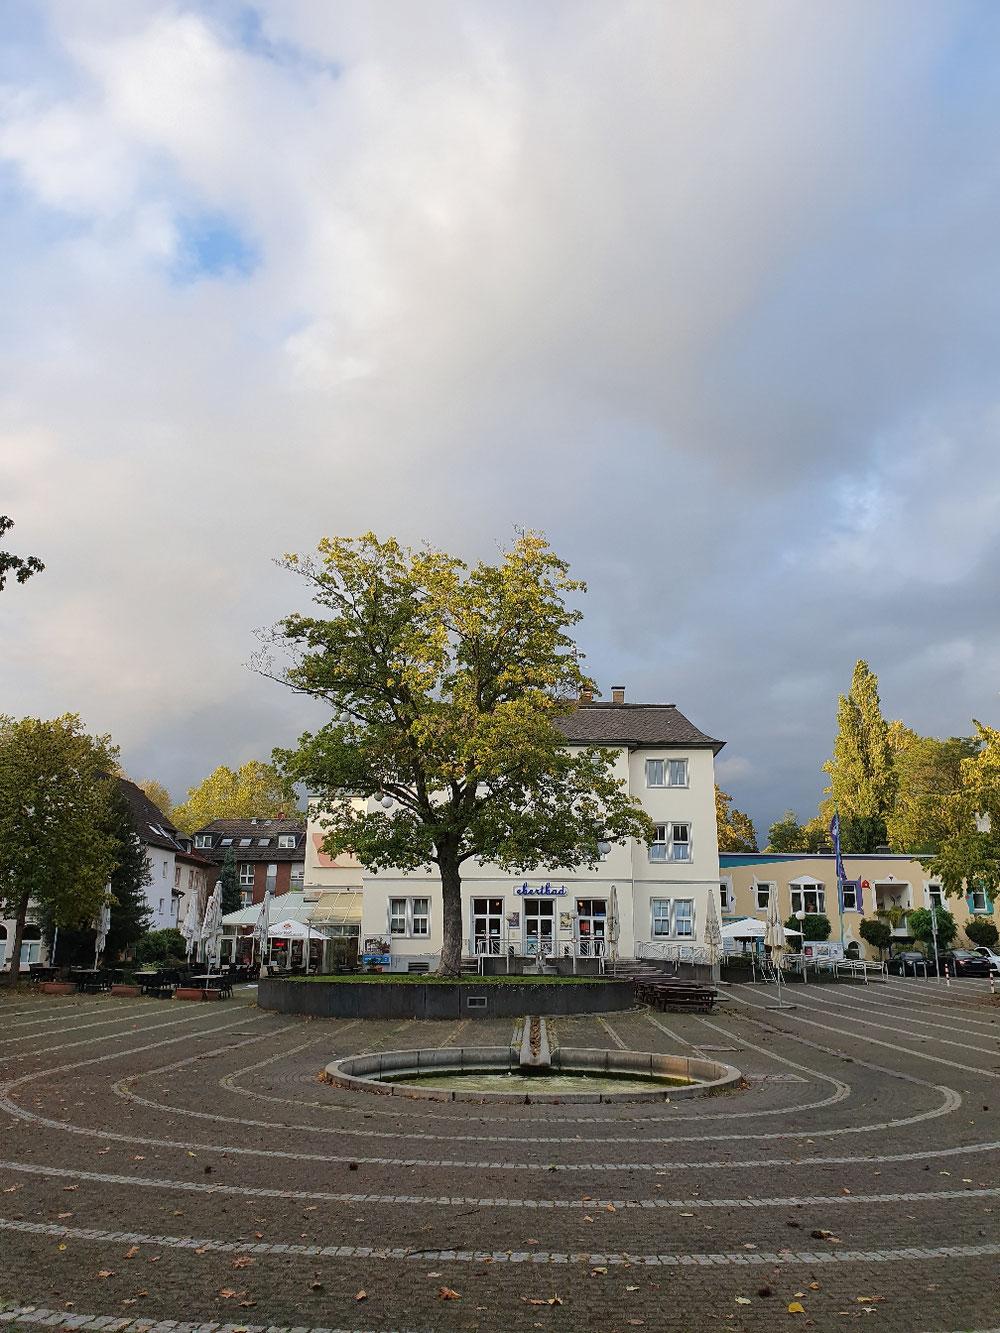 ...das altehrwürdige Ebertbad in Oberhausen!